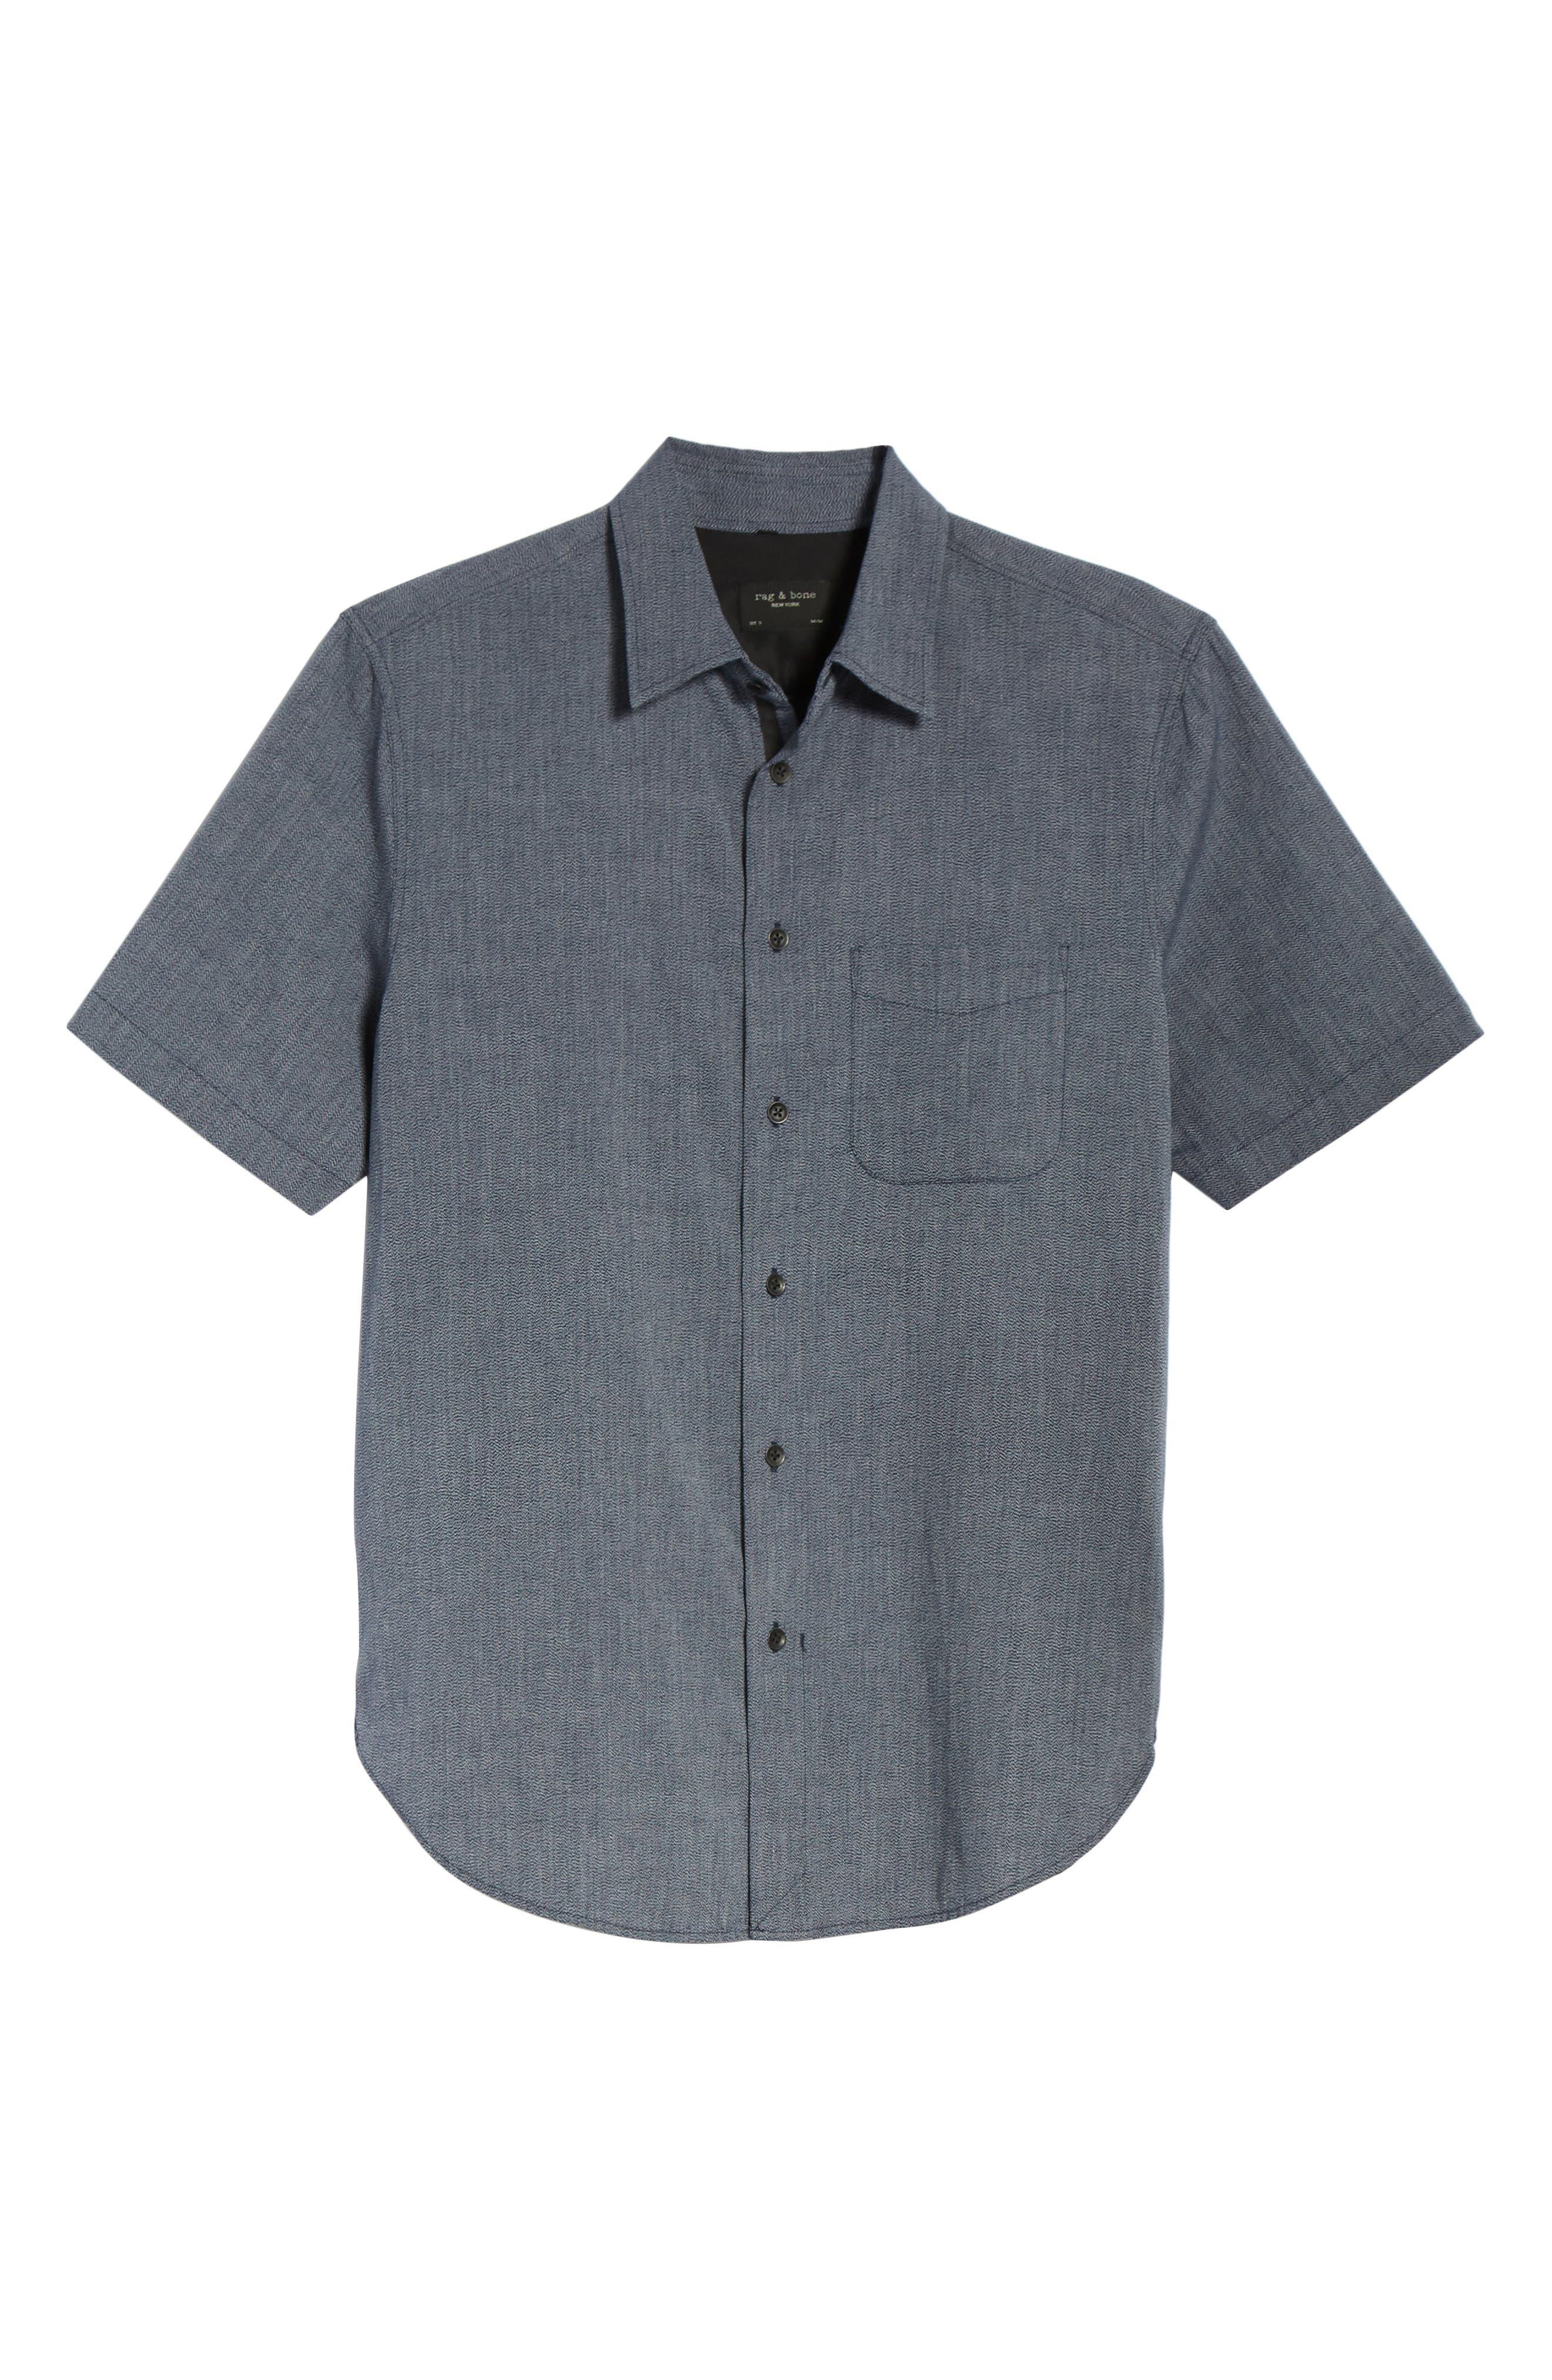 Regular Fit Short Sleeve Sport Shirt,                             Alternate thumbnail 6, color,                             BLUE